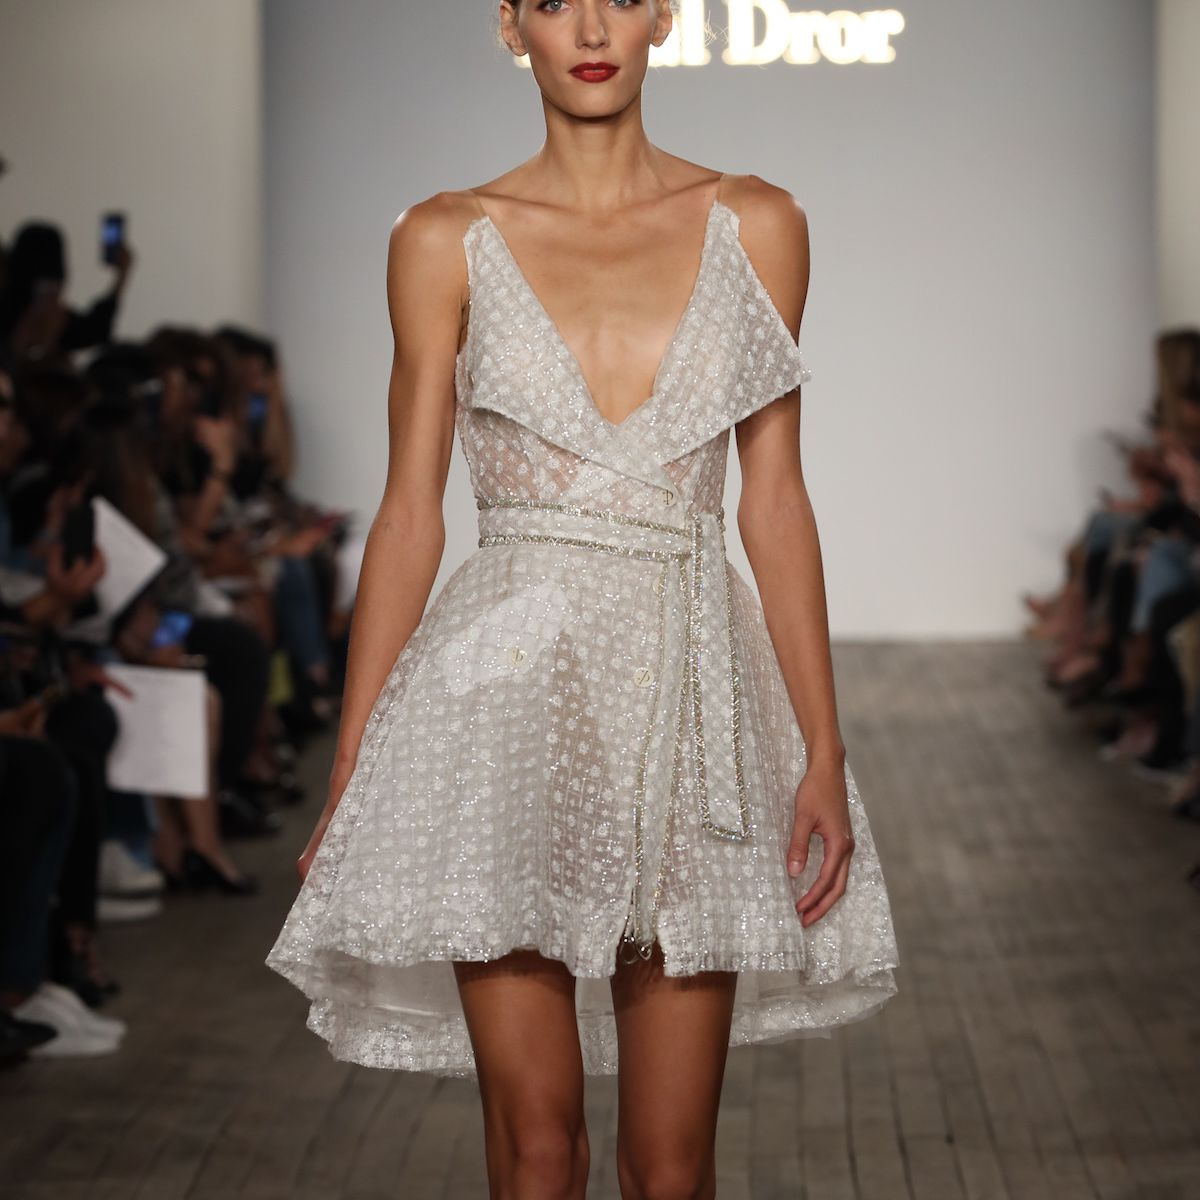 Model in mini wedding dress with lapels